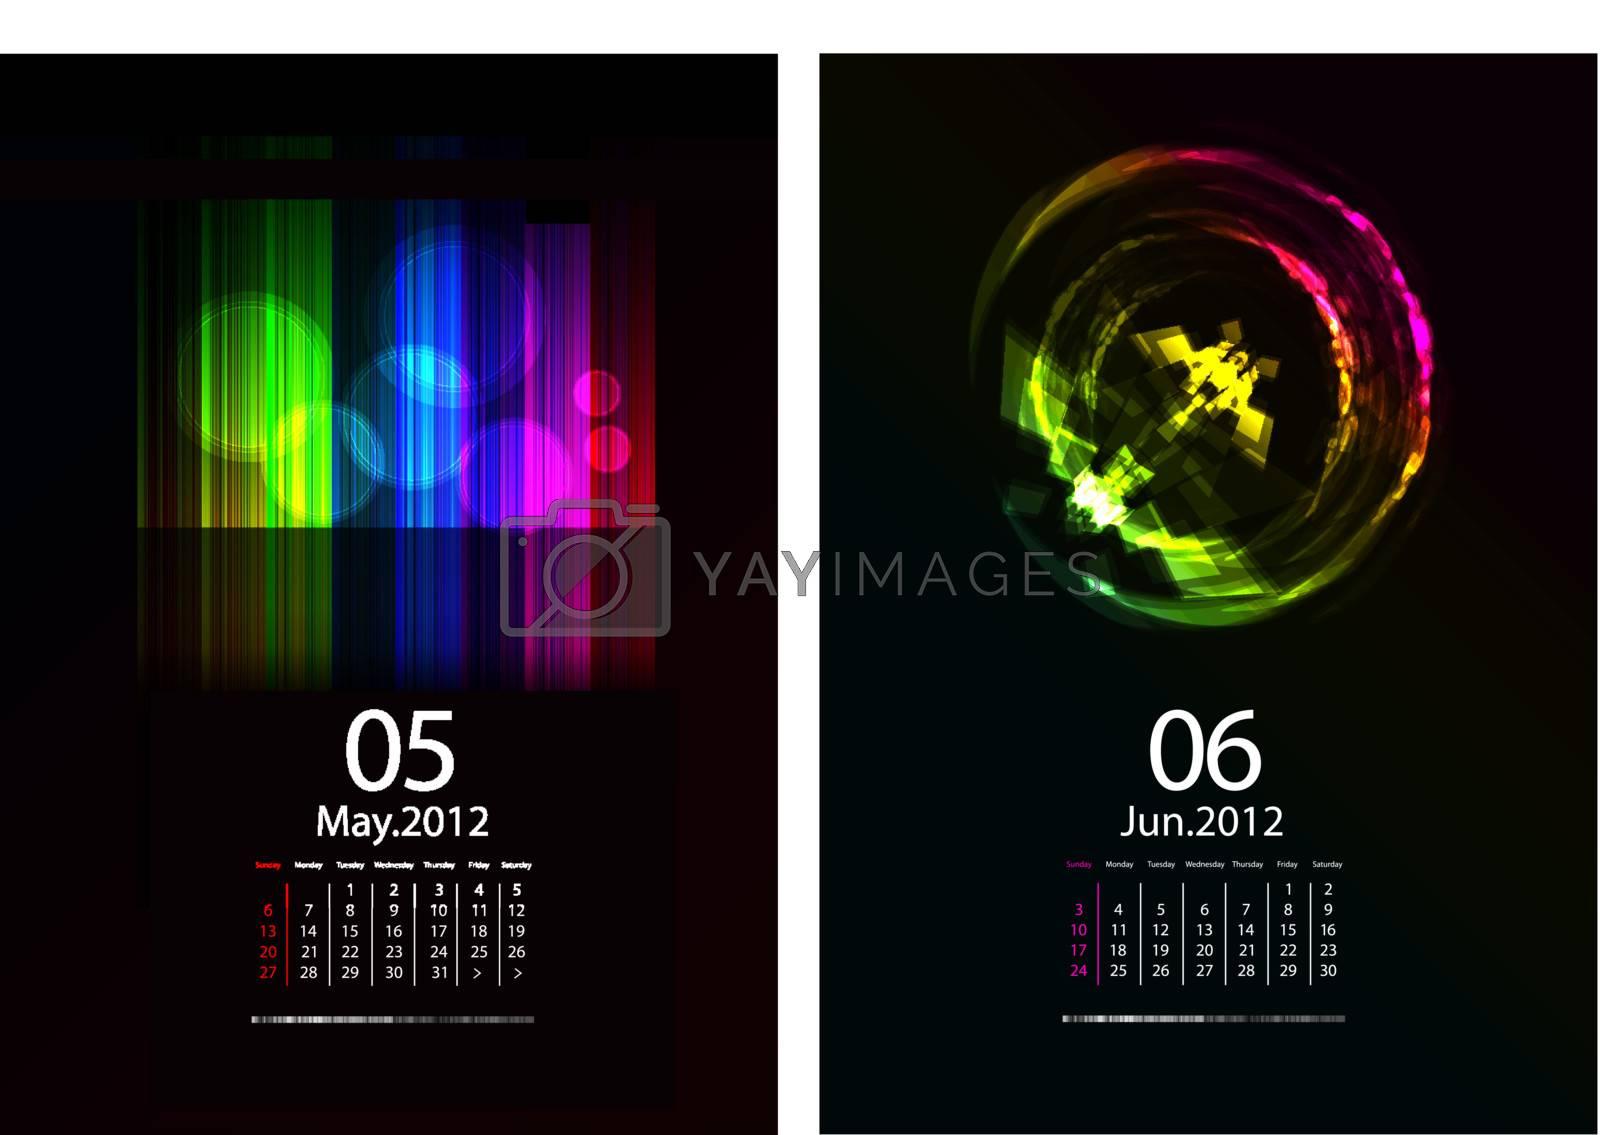 A Series Of Calendars Magic Light. May and June 2012